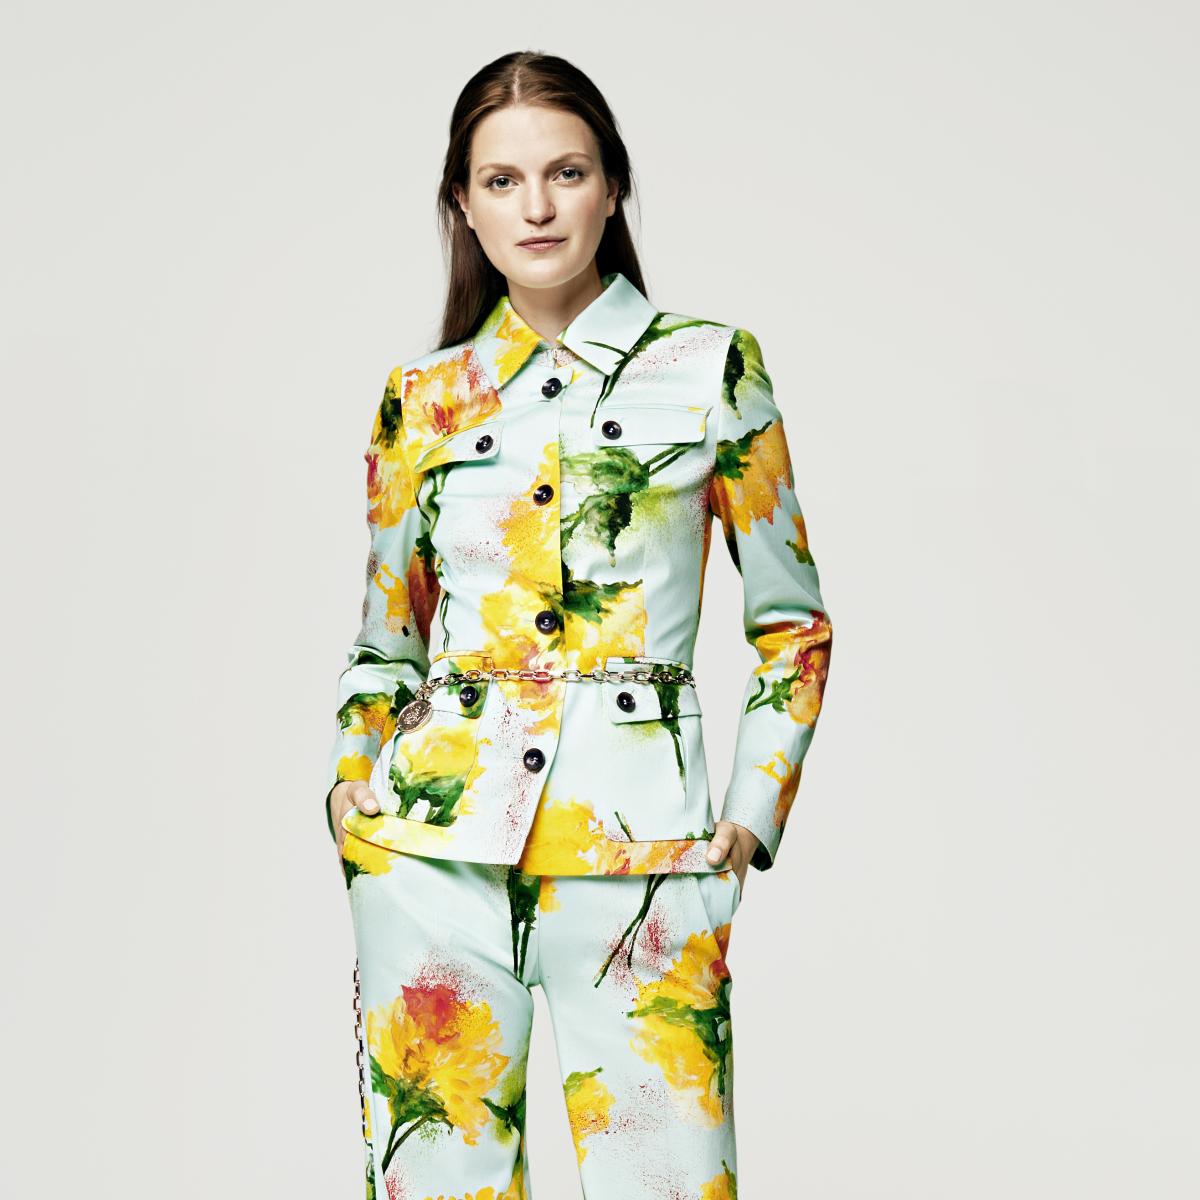 Escada spring summer look 1 at Elizabeth Anthony September 2015